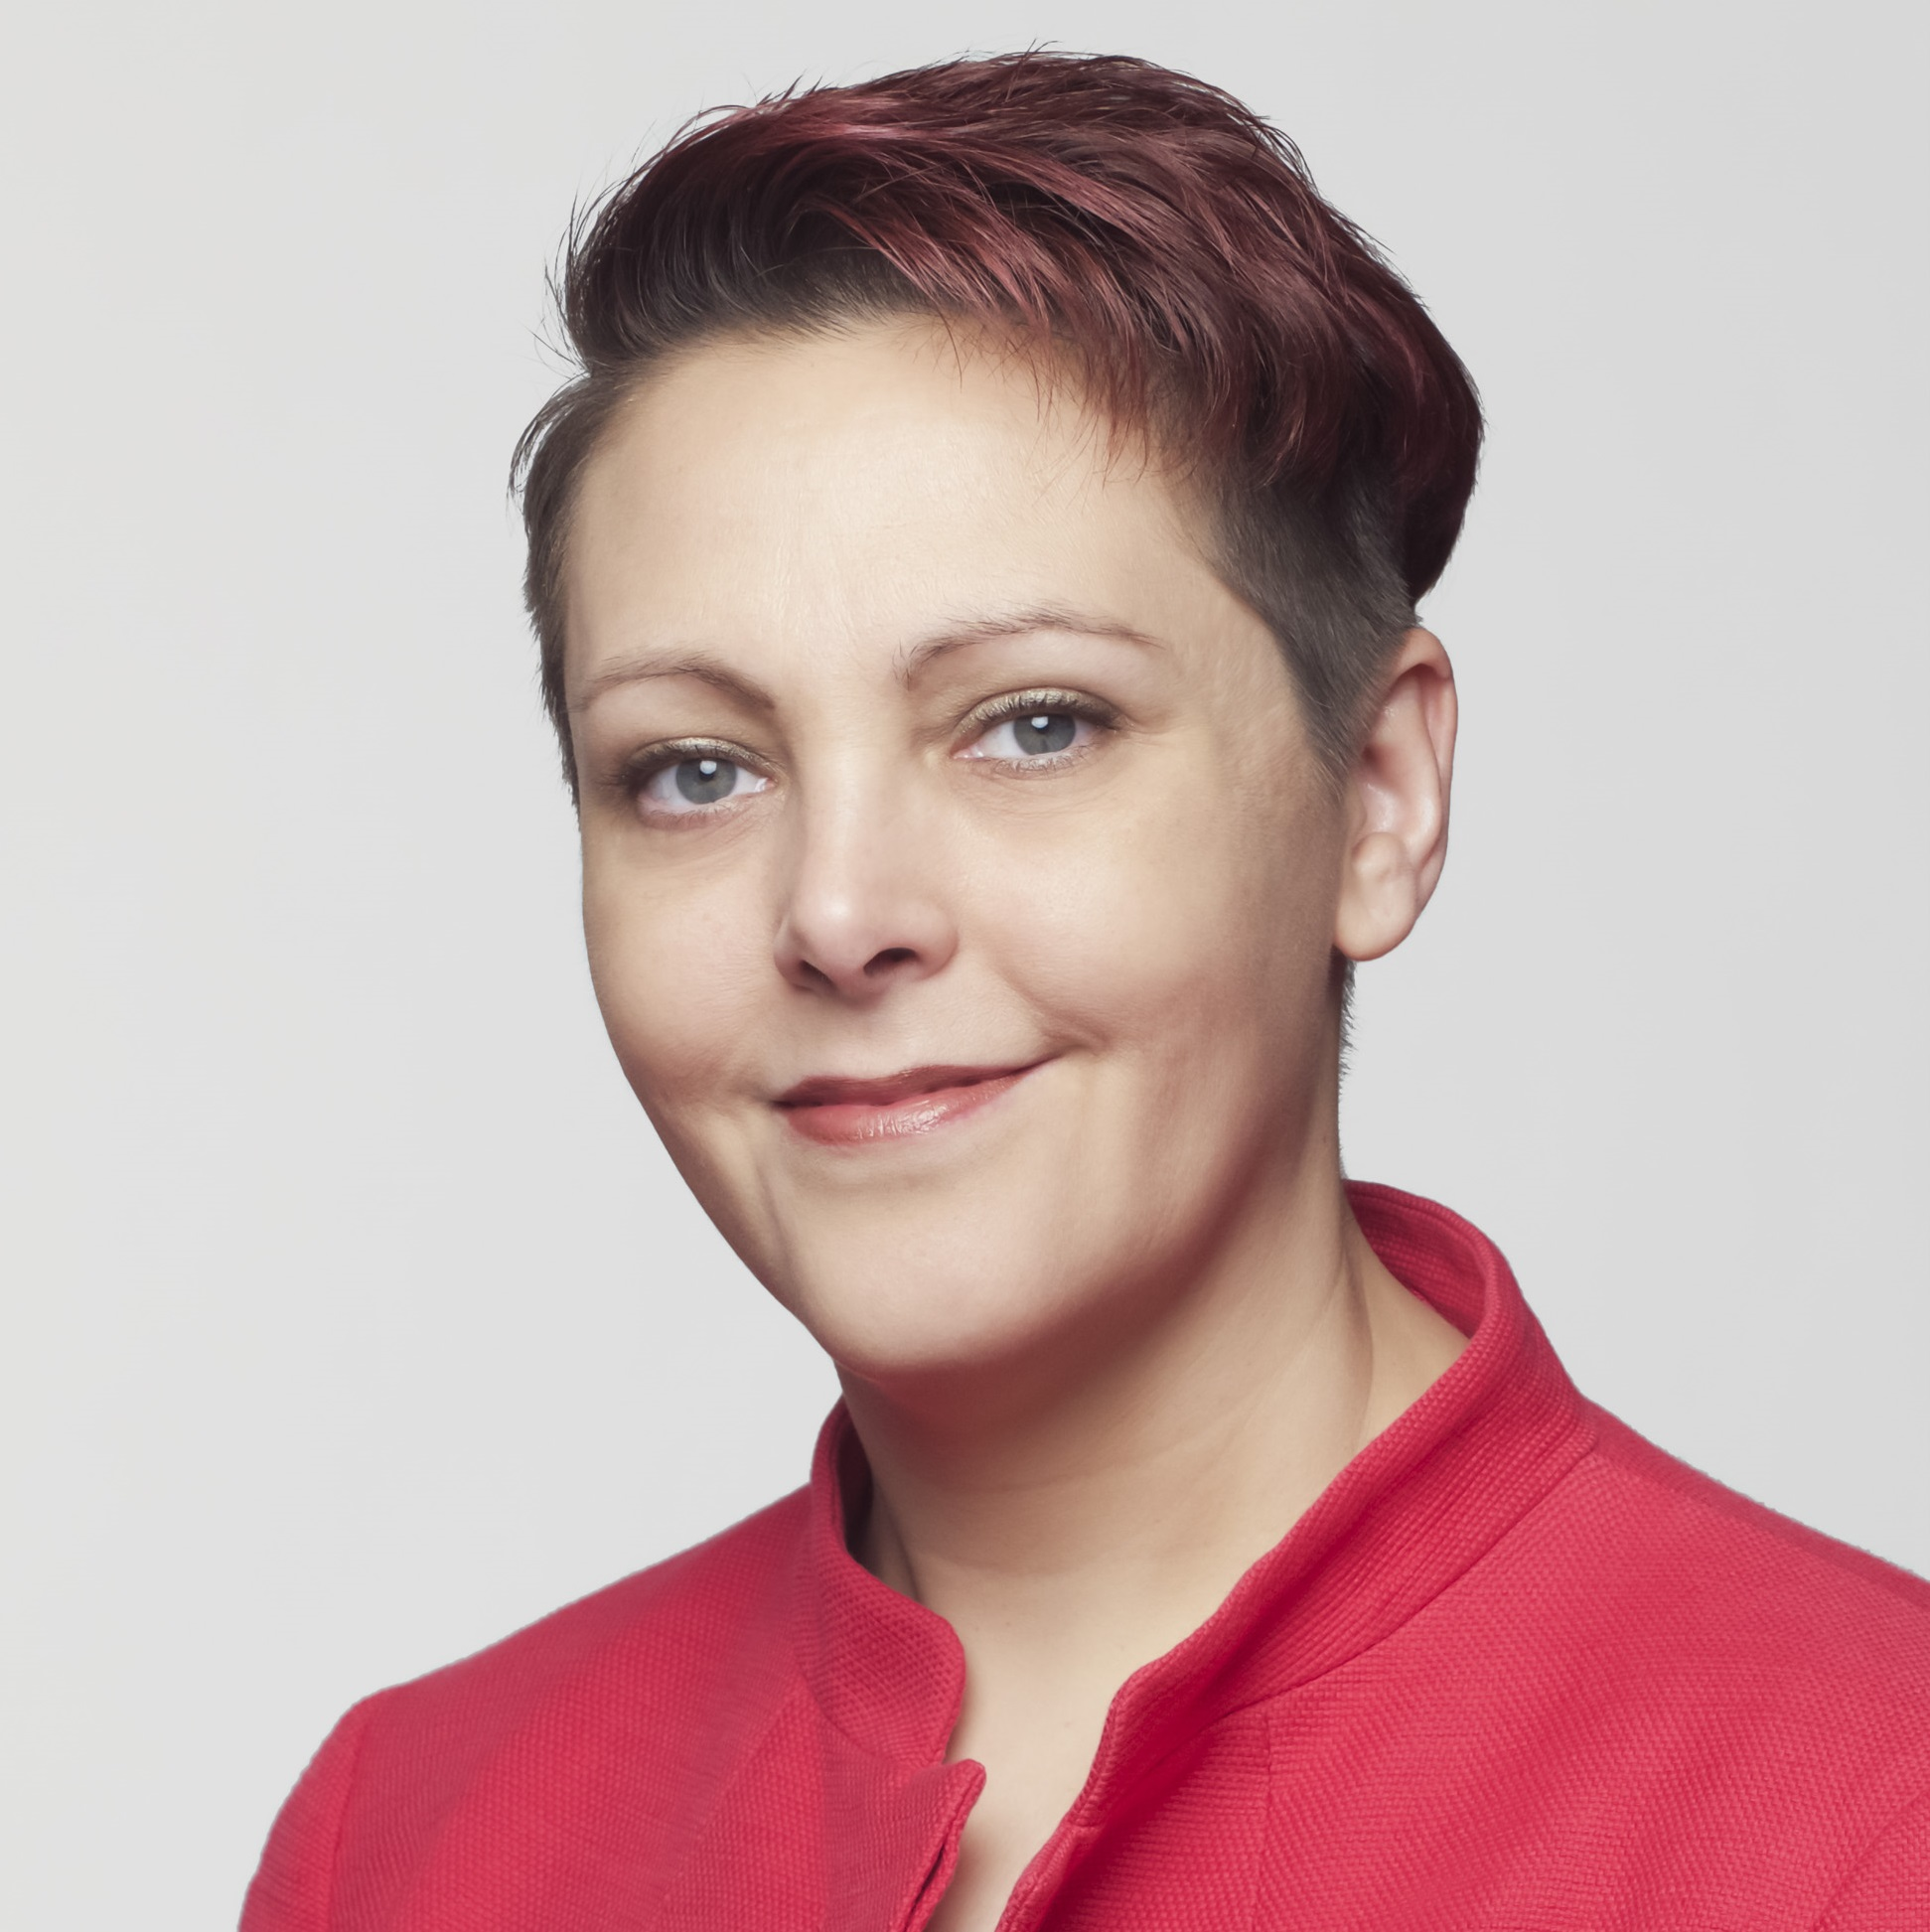 Amy Puckett headshot